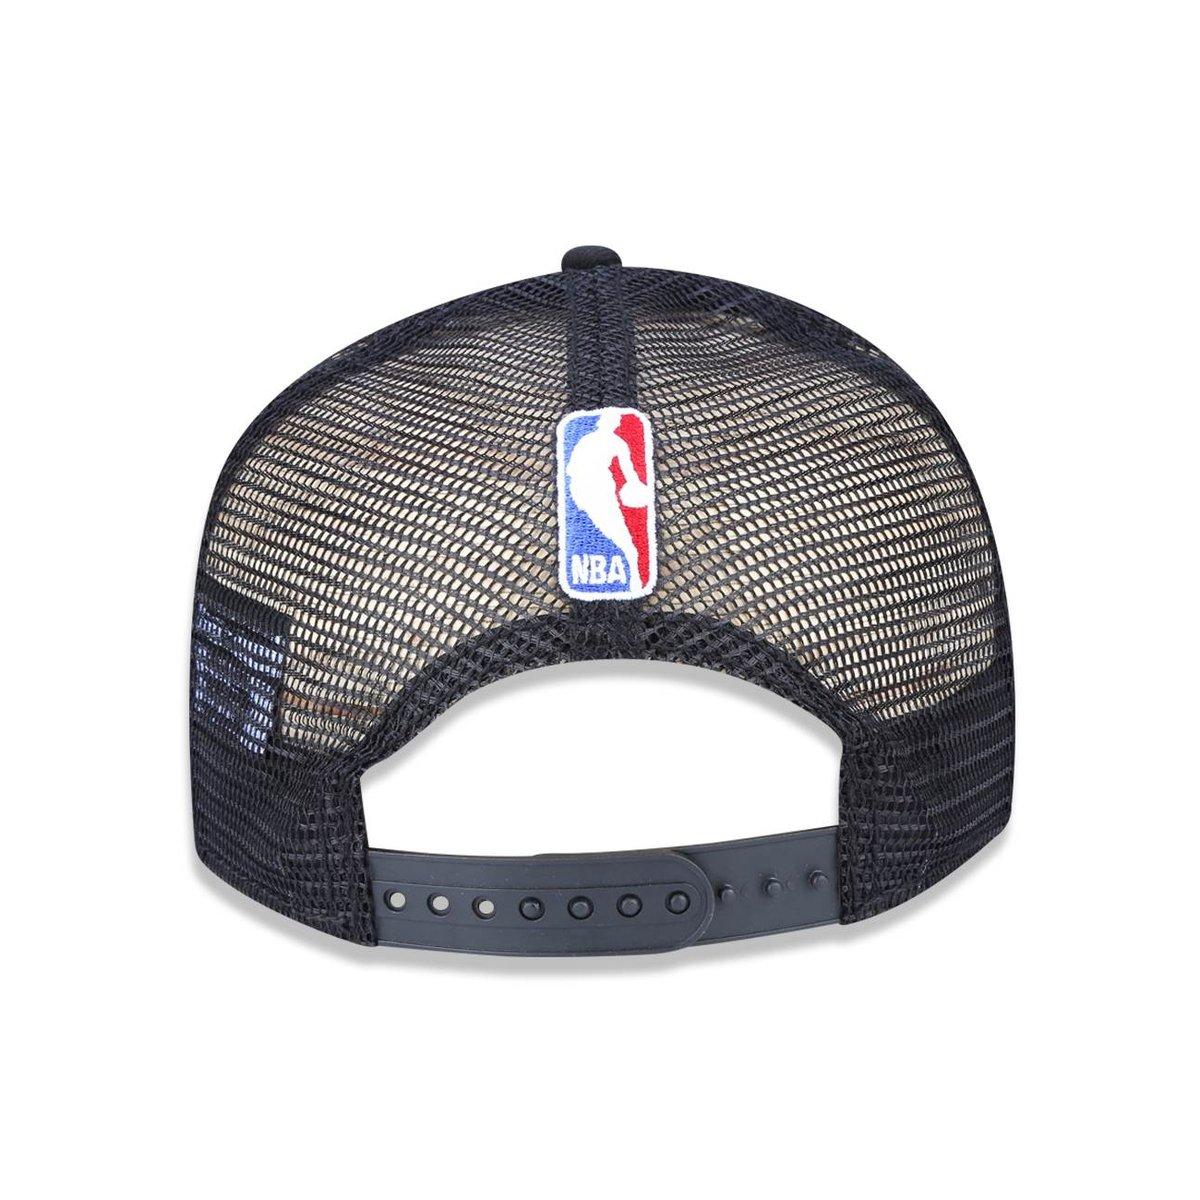 ... Boné 950 Original Fit Chicago Bulls NBA Aba Reta Snapback New Era ... 1f63e6e5aa2